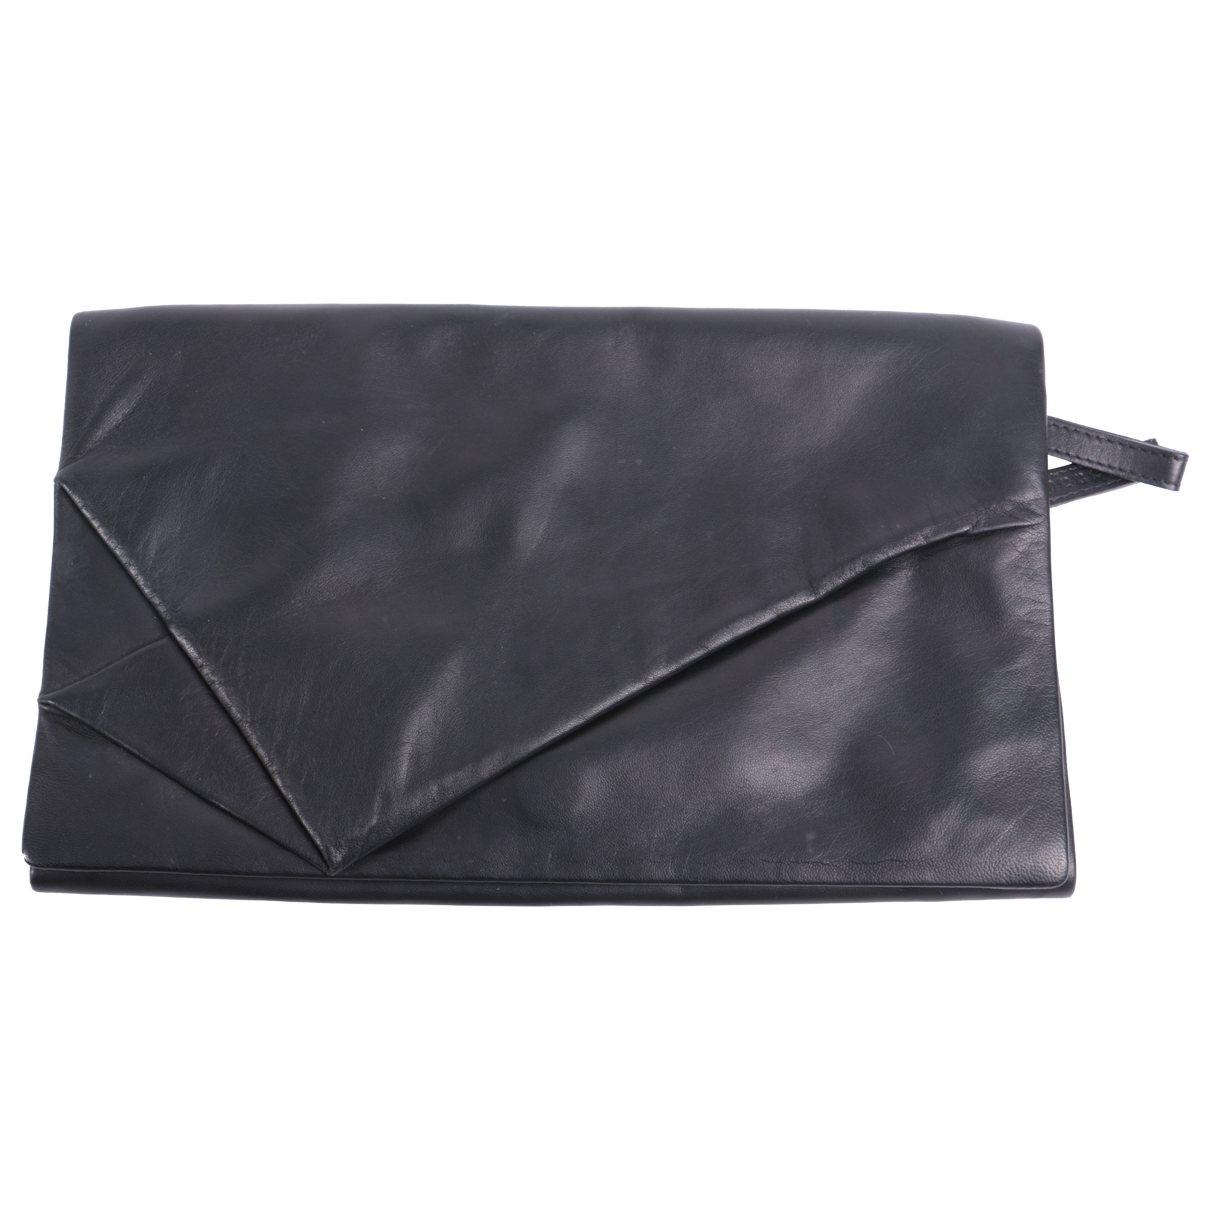 Maison Martin Margiela \N Black Leather Clutch bag for Women \N